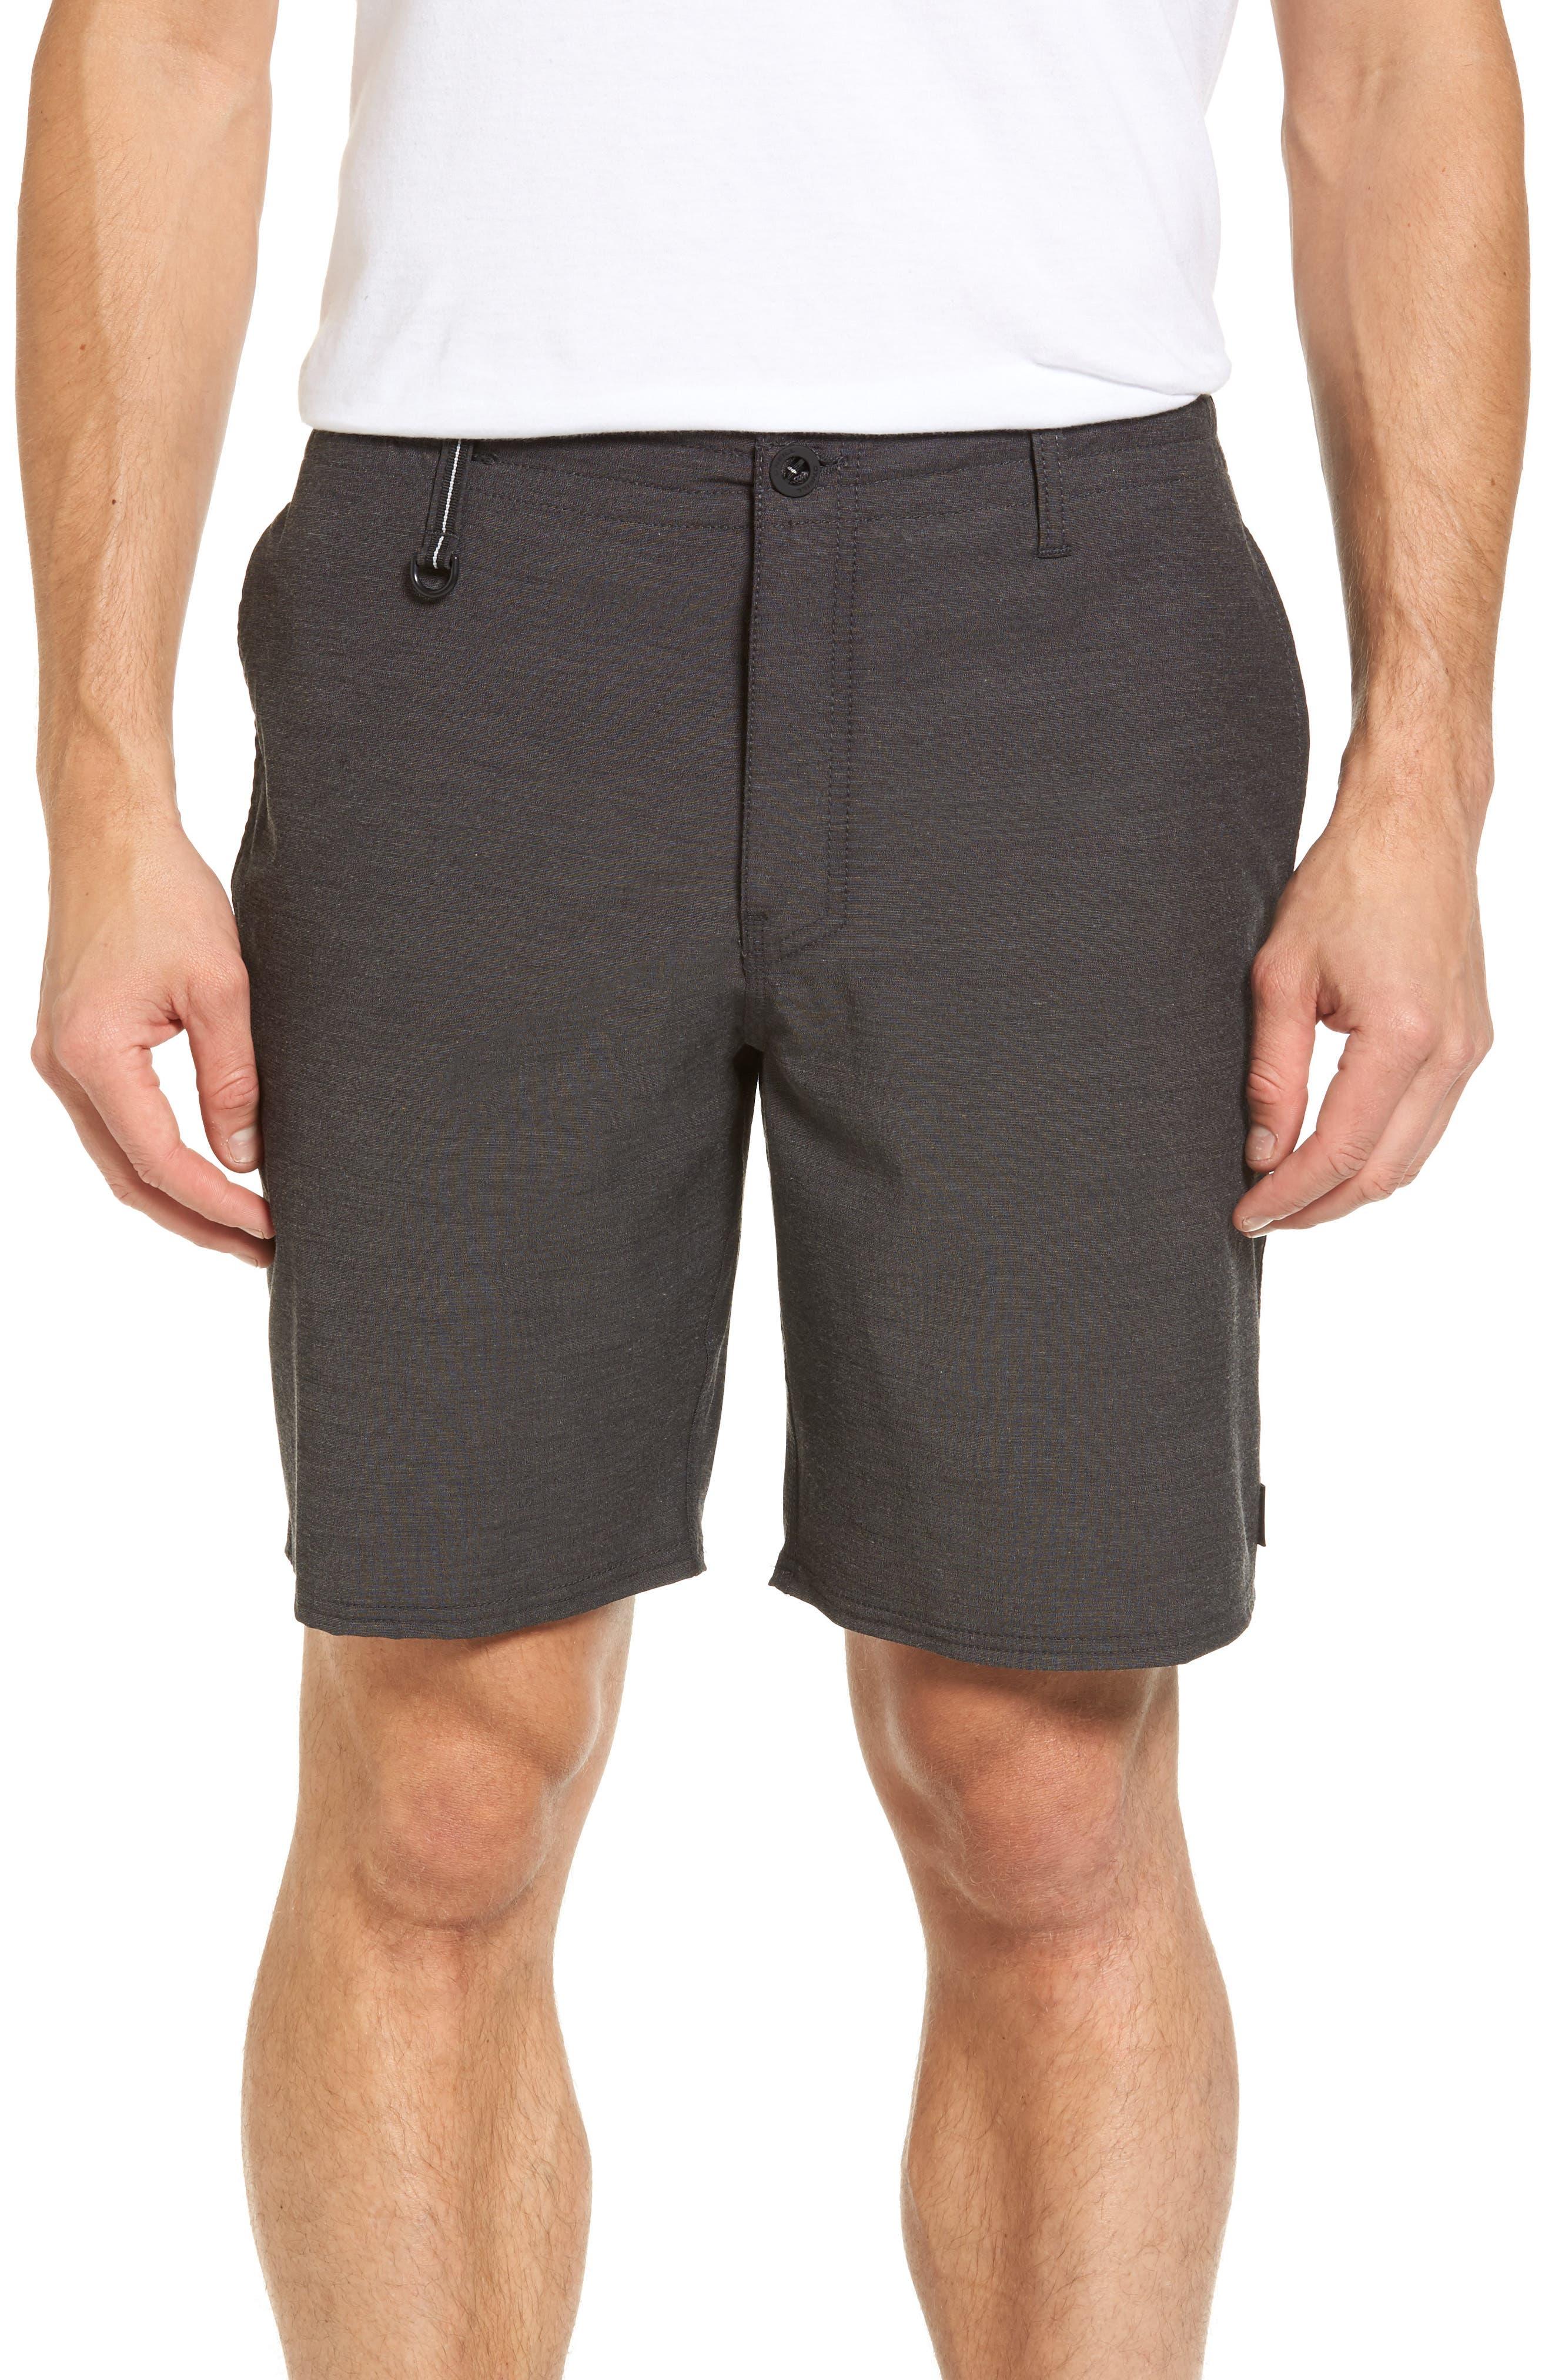 Traveler Recon Hybrid Shorts,                             Main thumbnail 1, color,                             Black